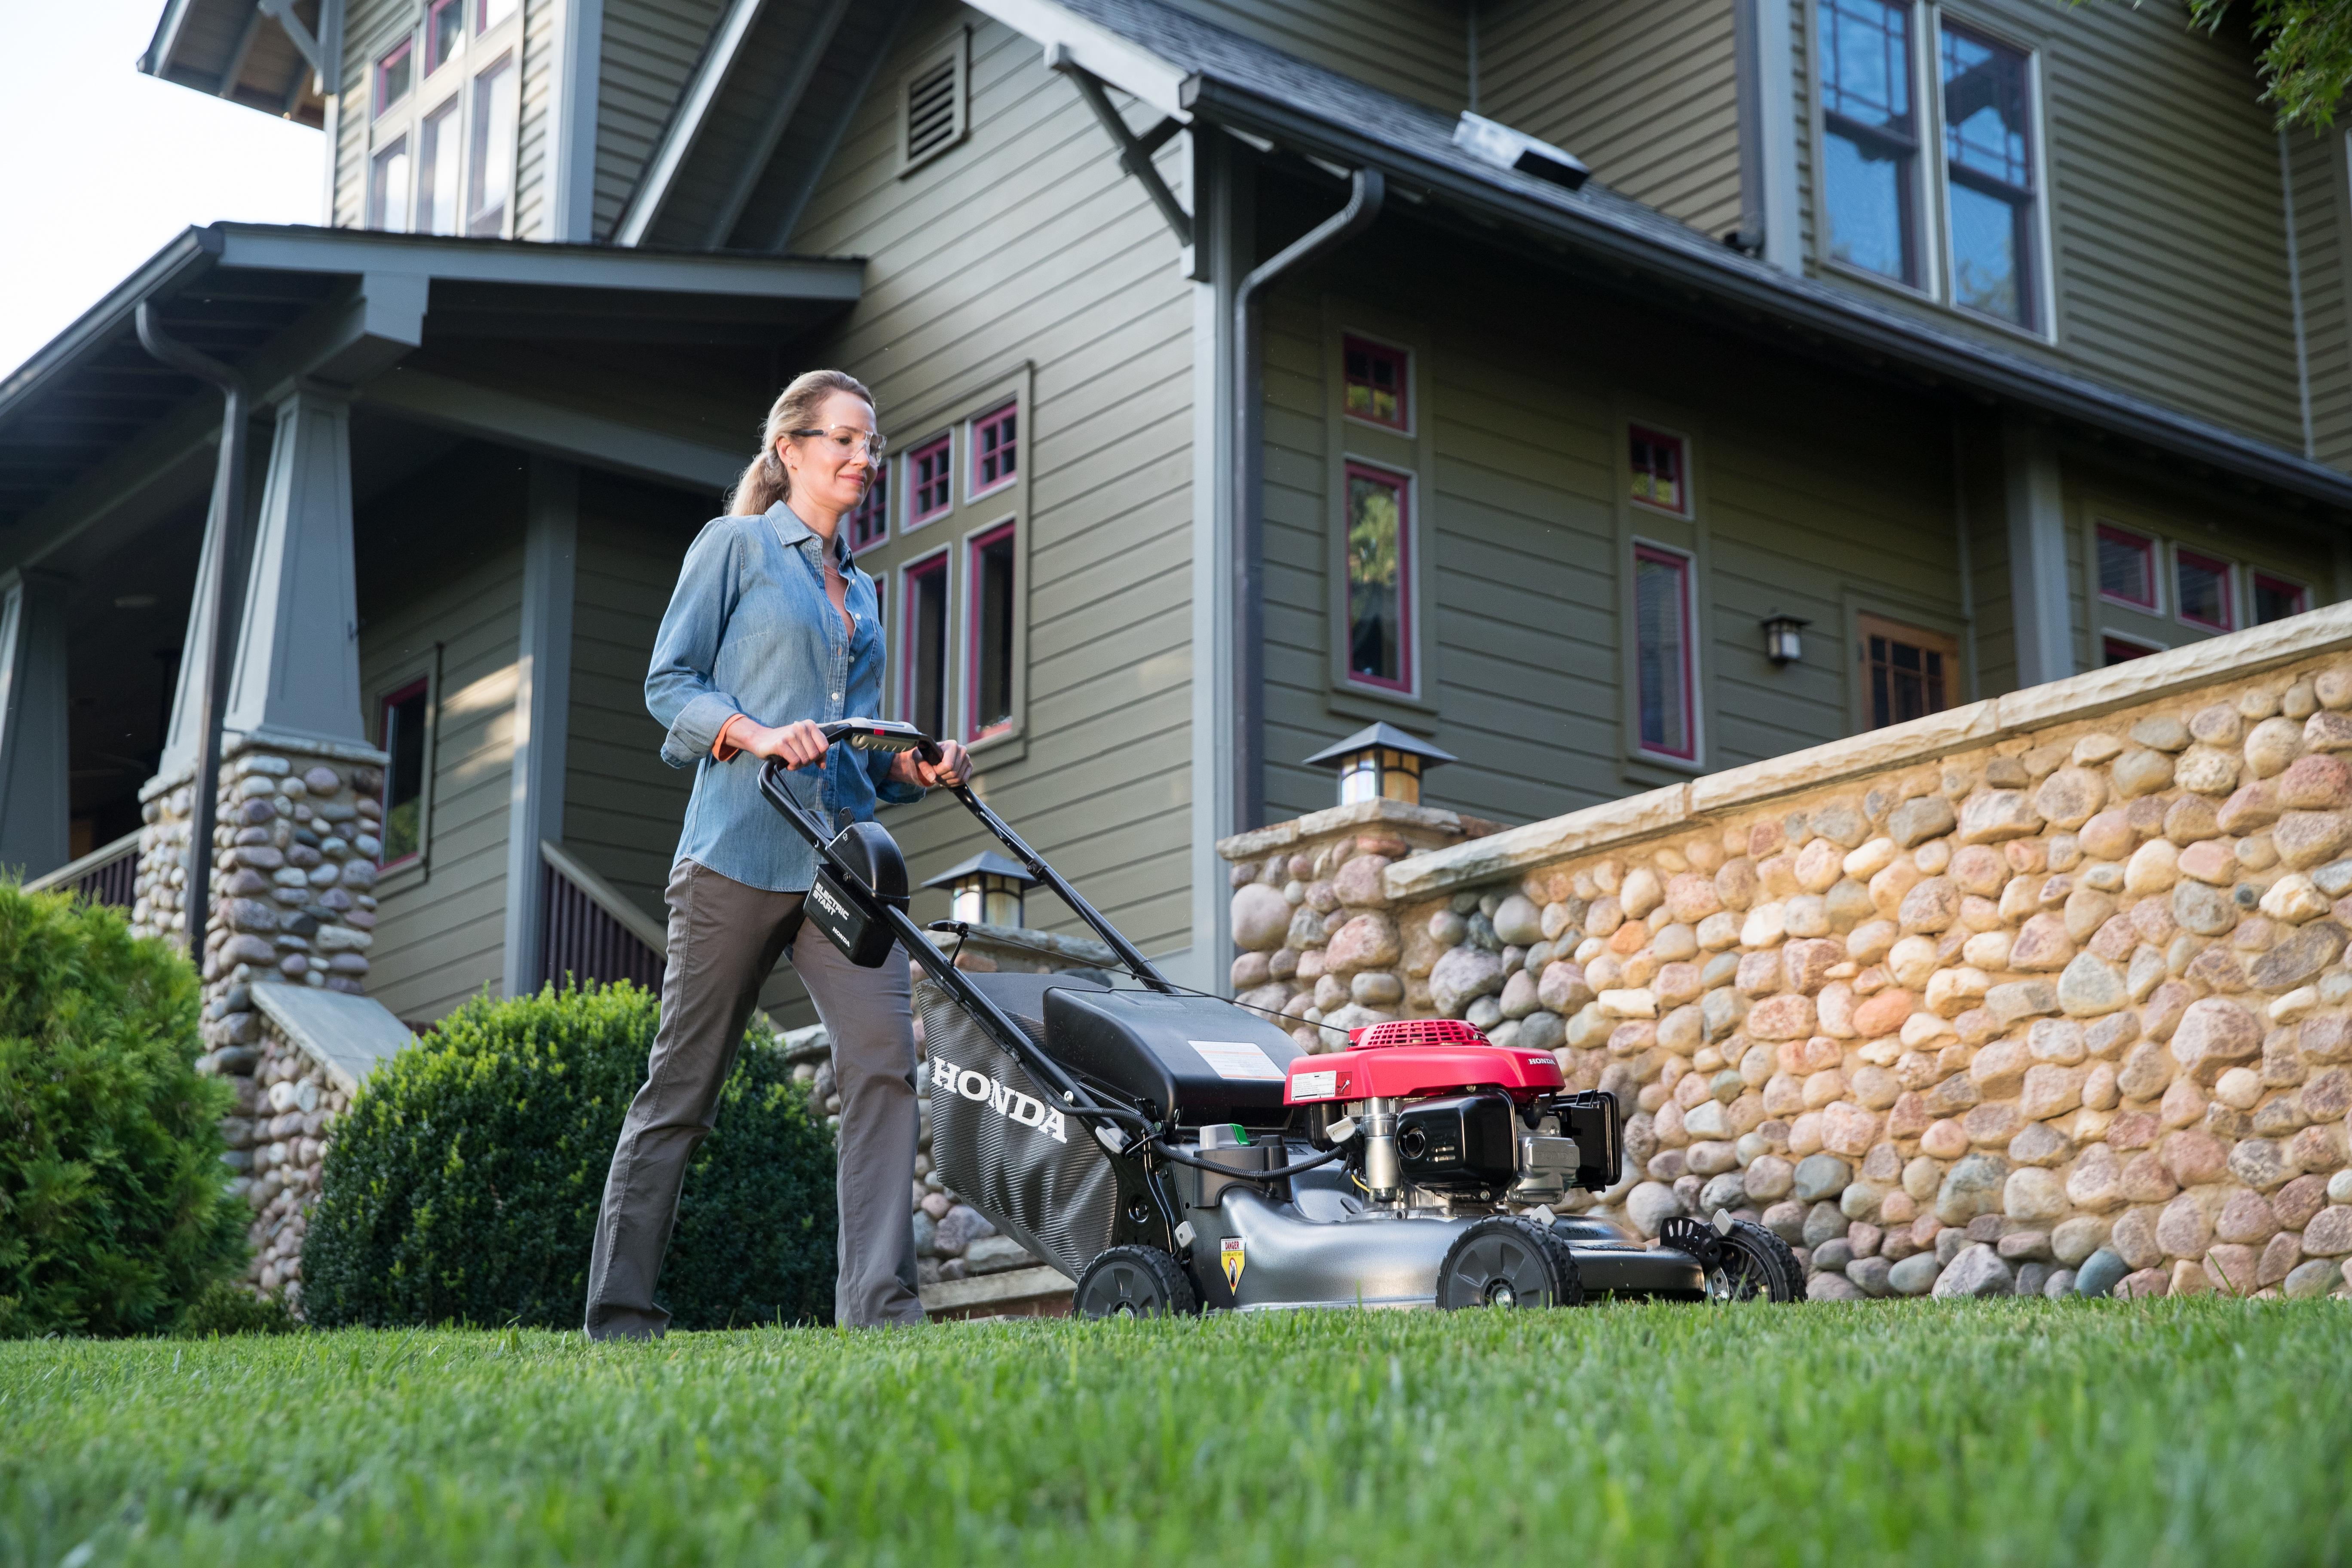 Woman Pushing Honda HRR Lawn Mower in Cumberland, MD